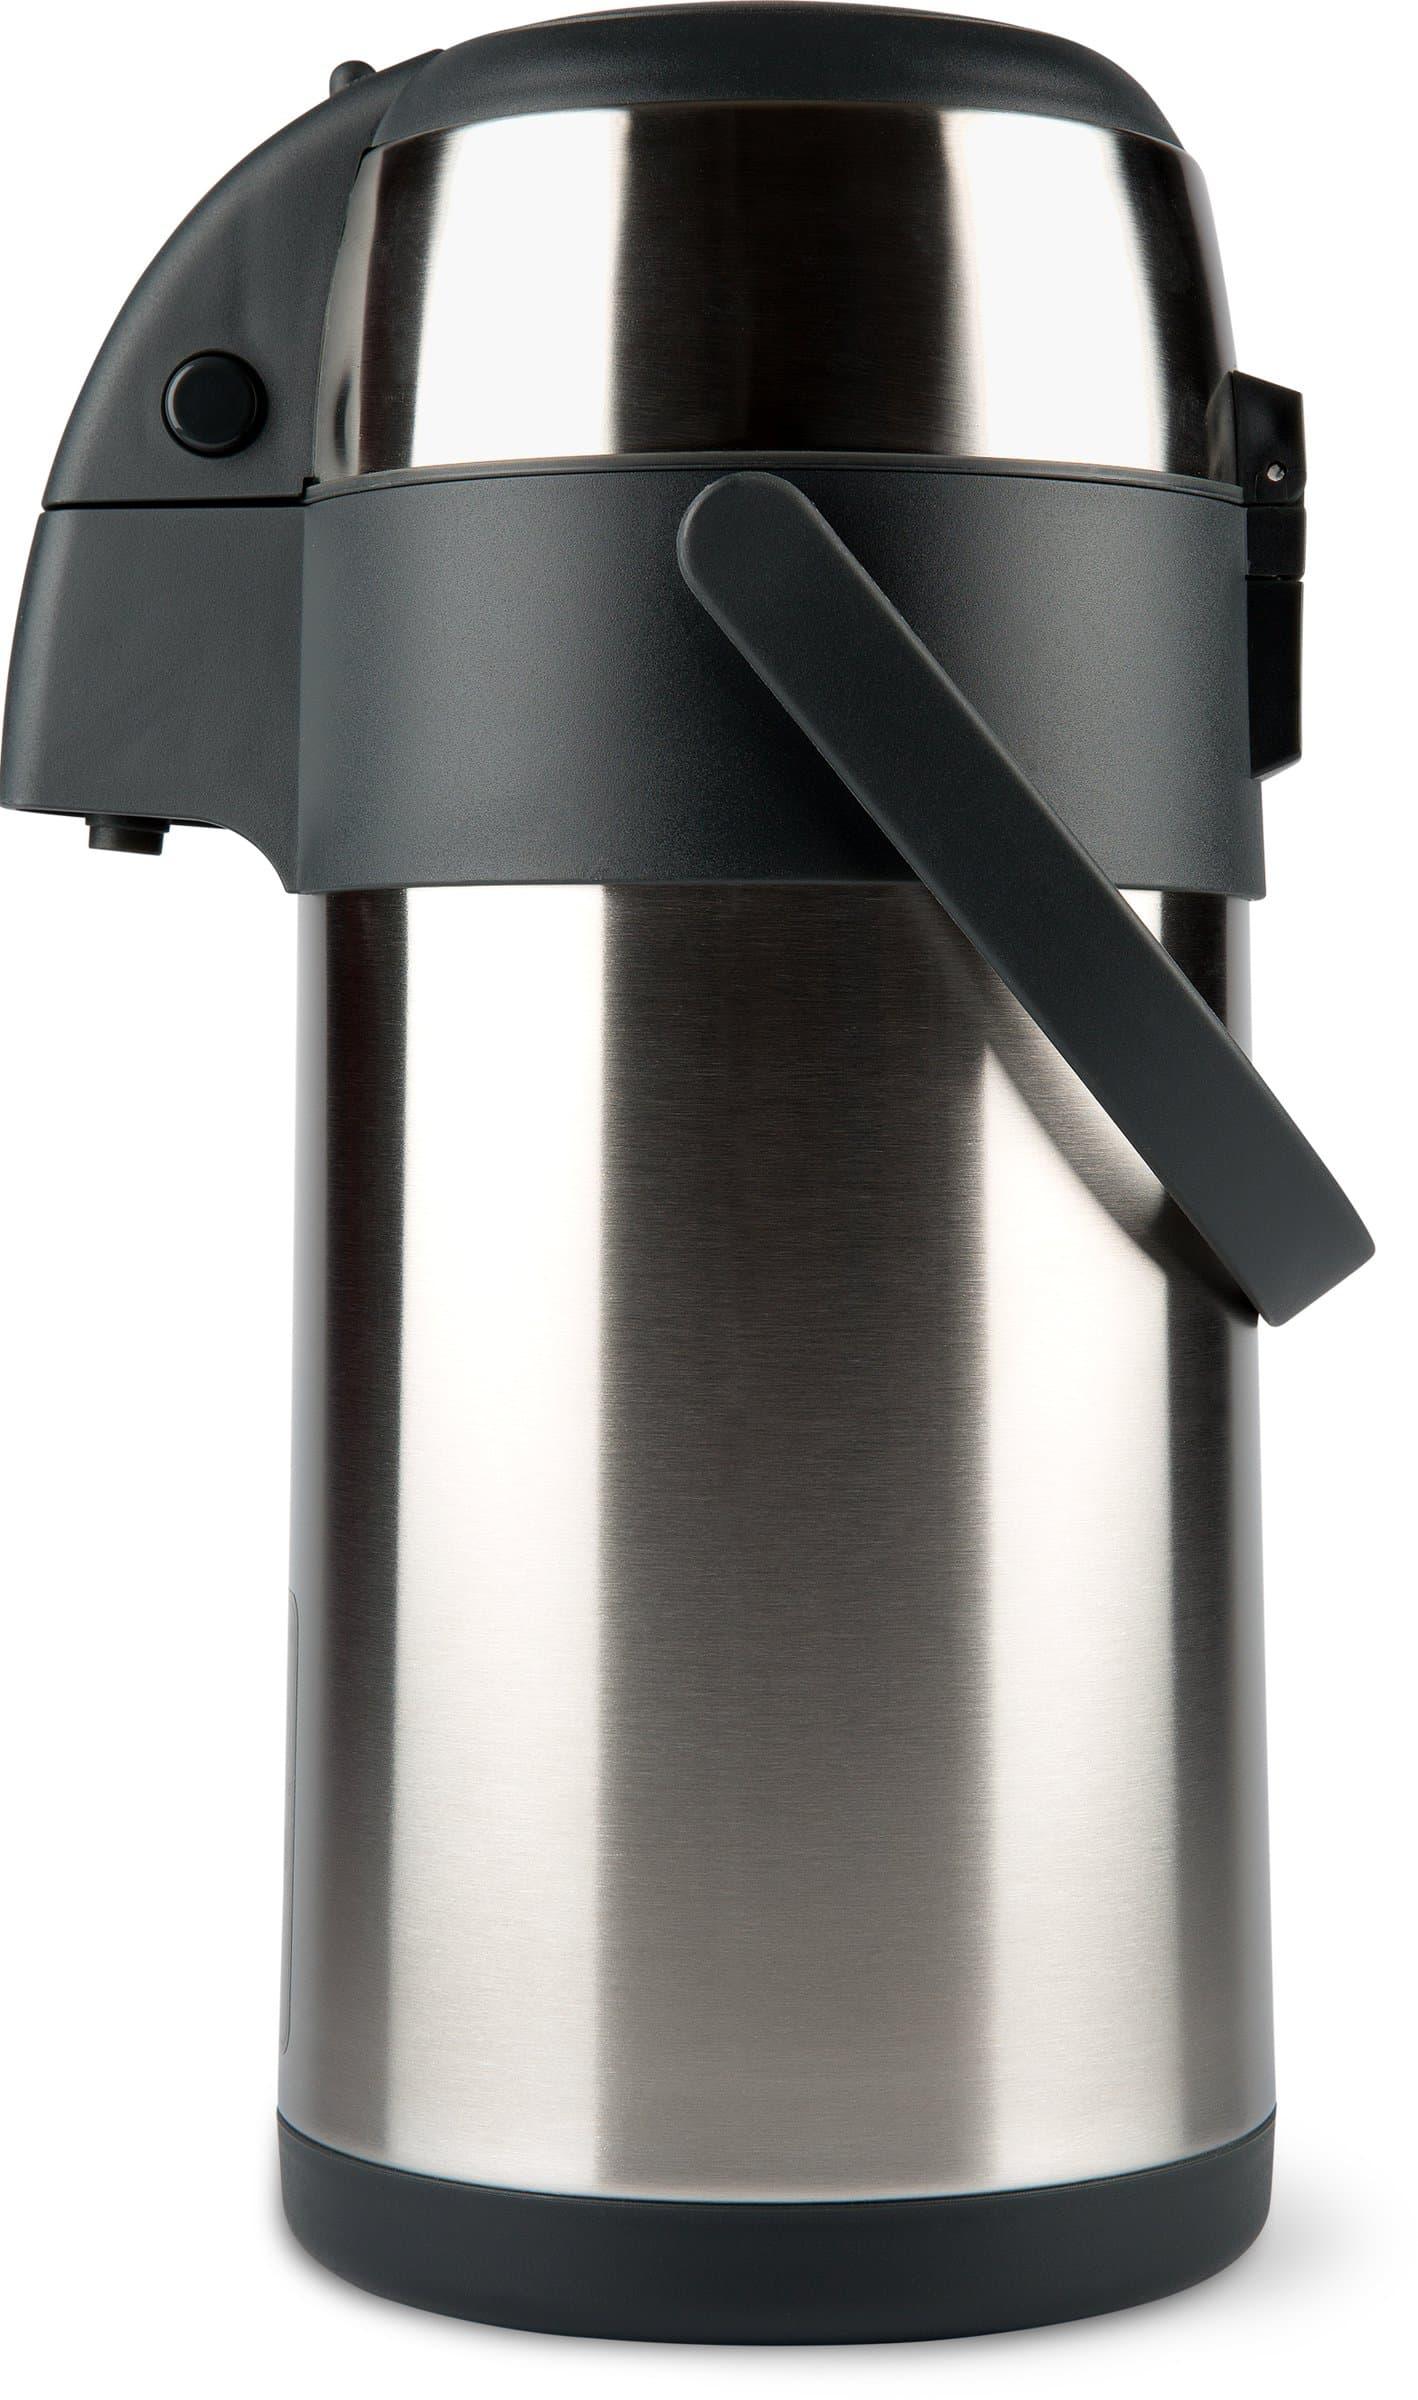 Cucina & Tavola CUCINA & TAVOLA Air-Pot 2.3L